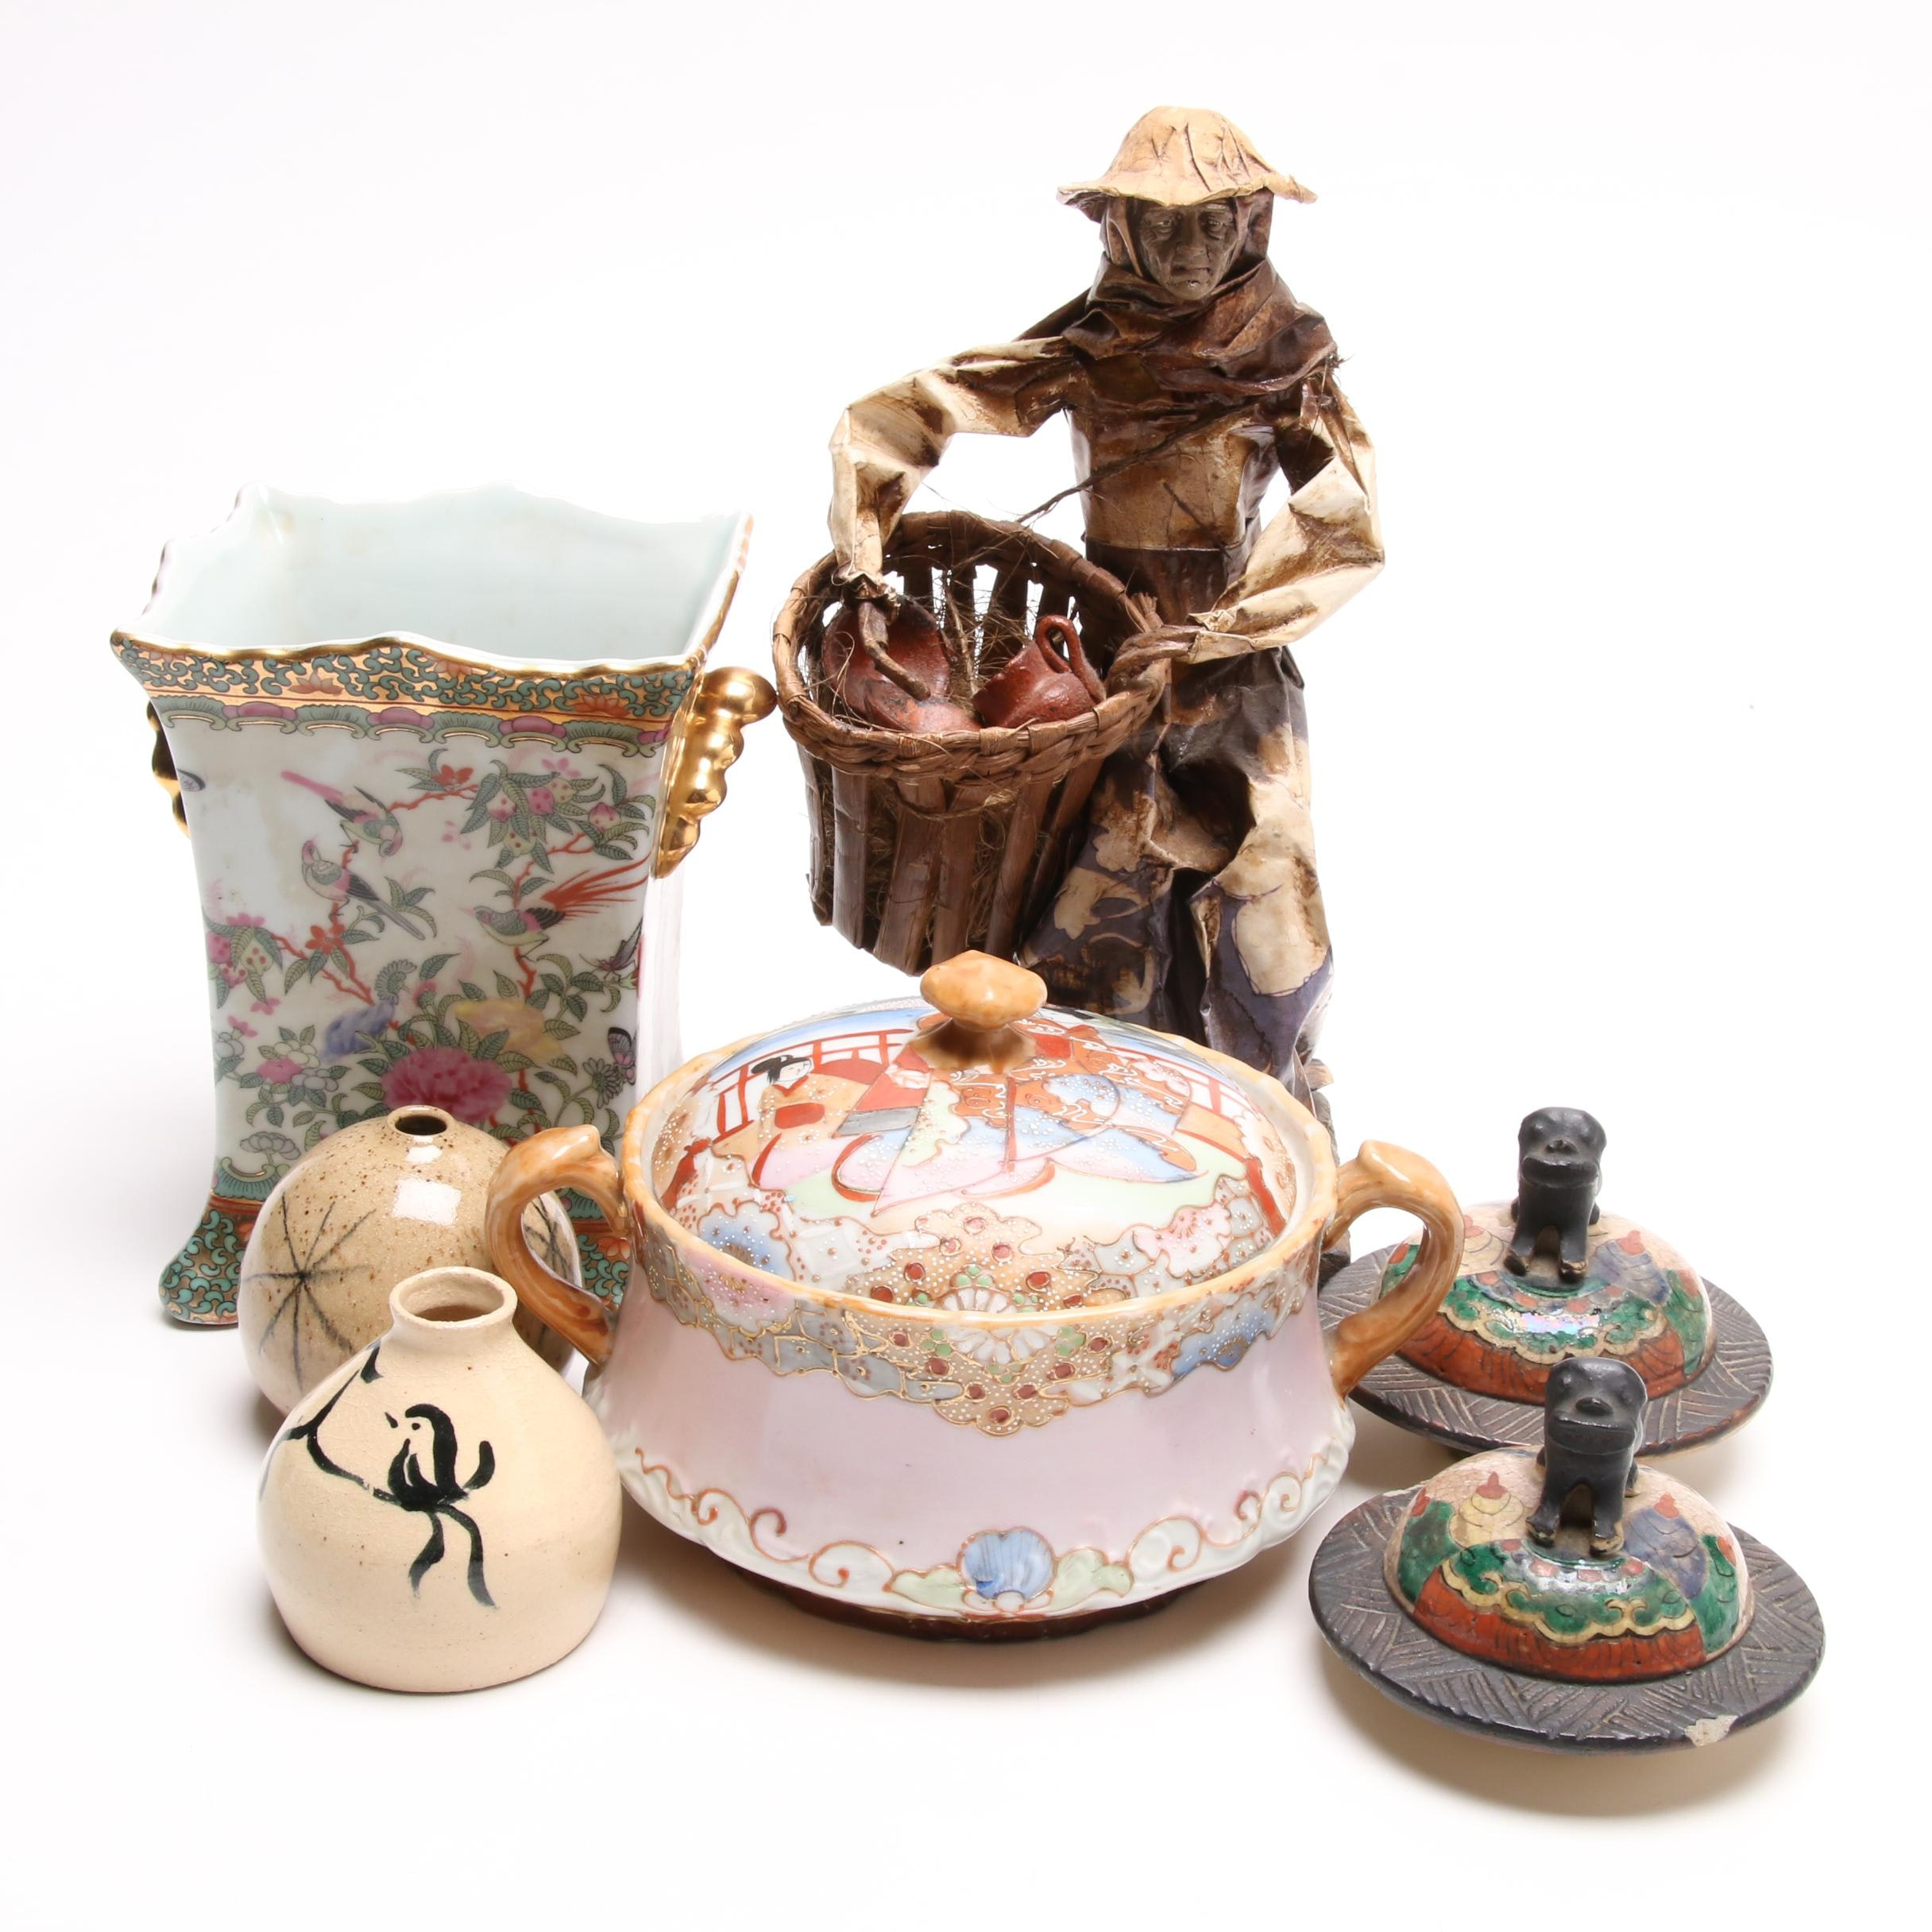 Decorative Asian Ceramics and More